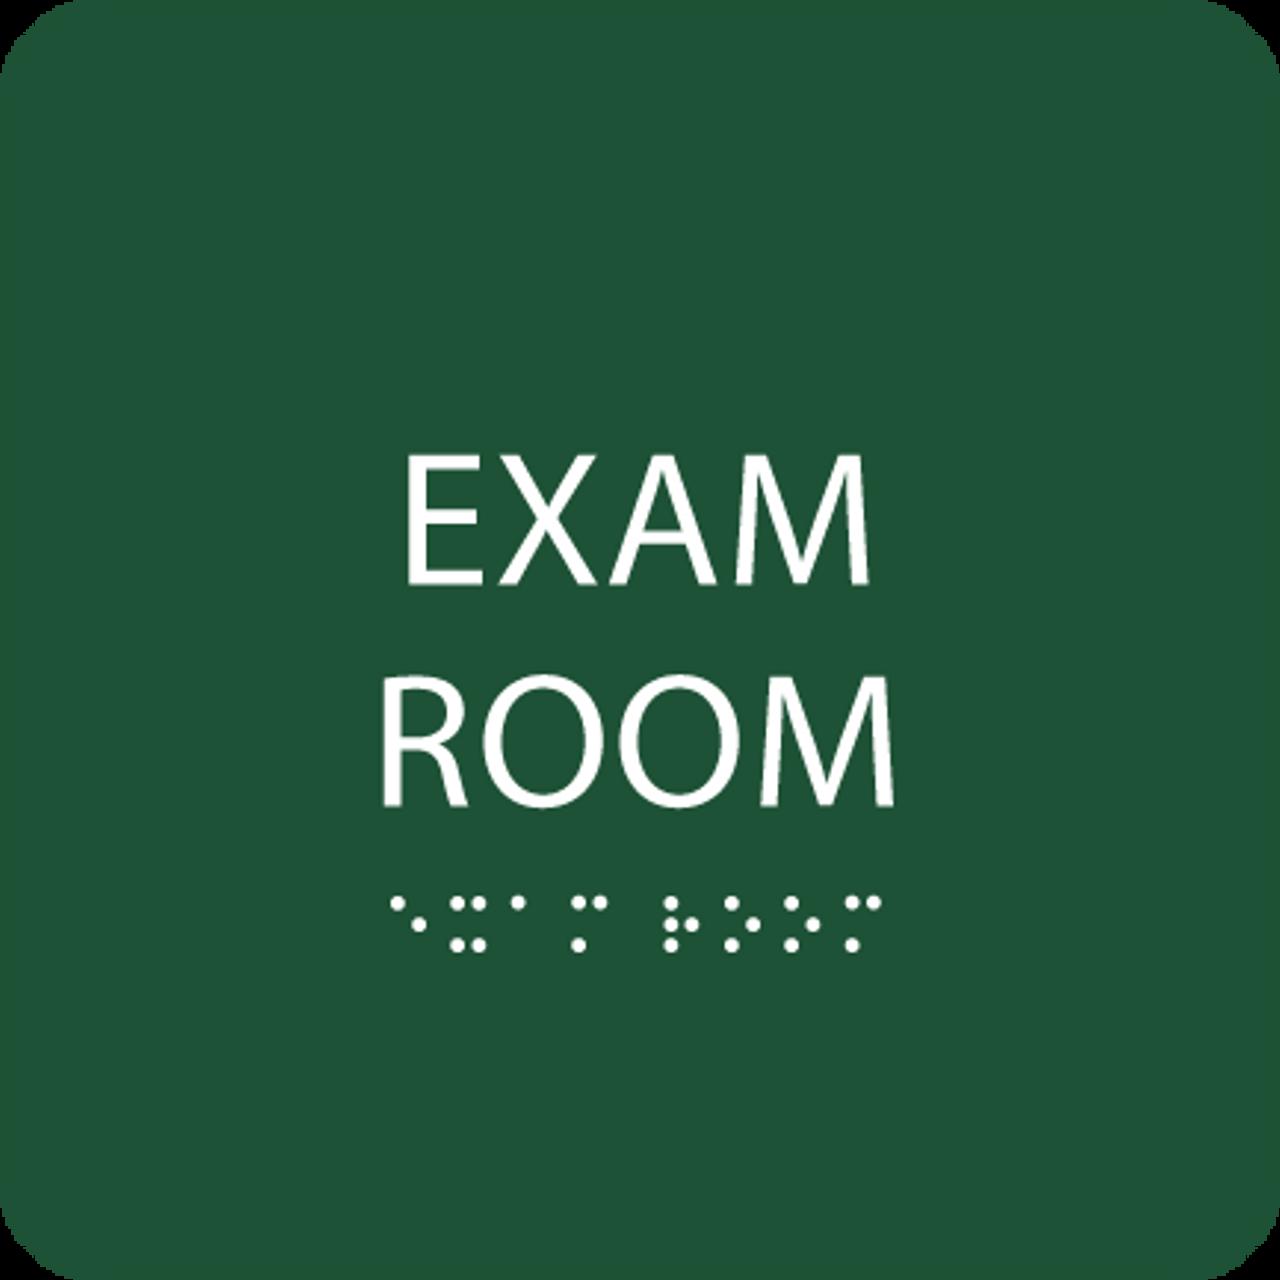 "Exam Room ADA Sign - 6"" x 6"""